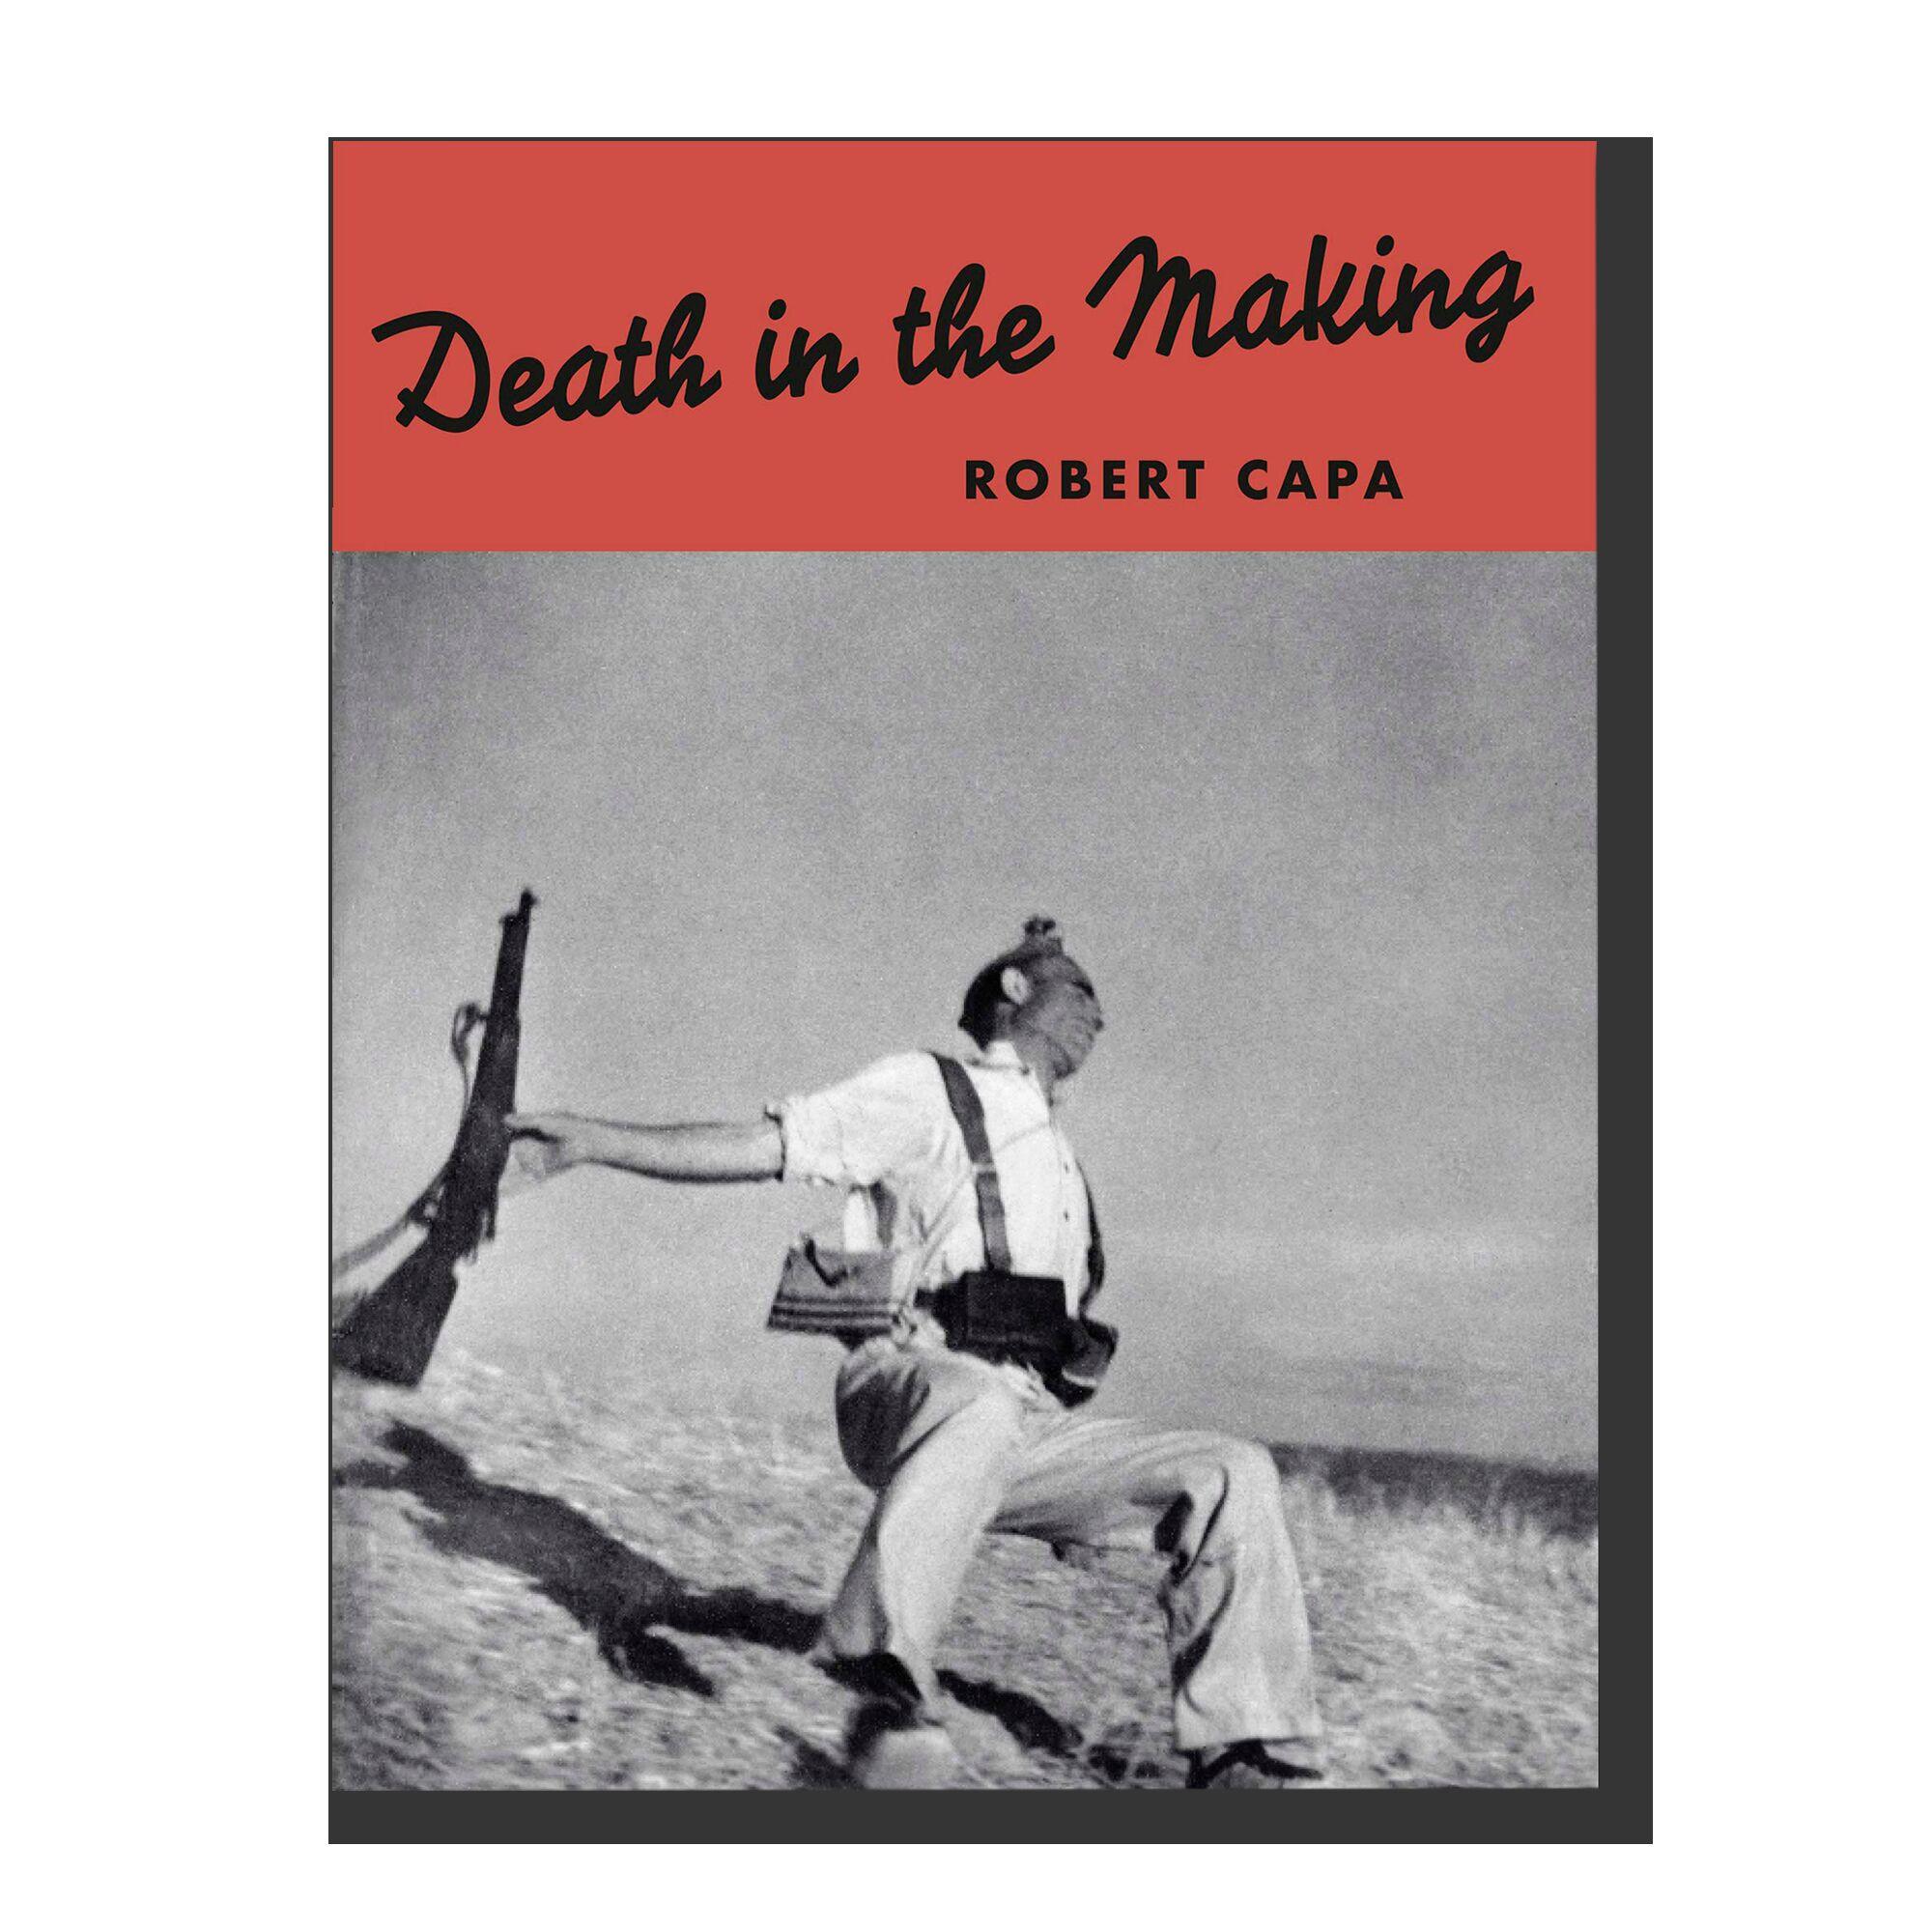 Robert Capa: Death in the Making